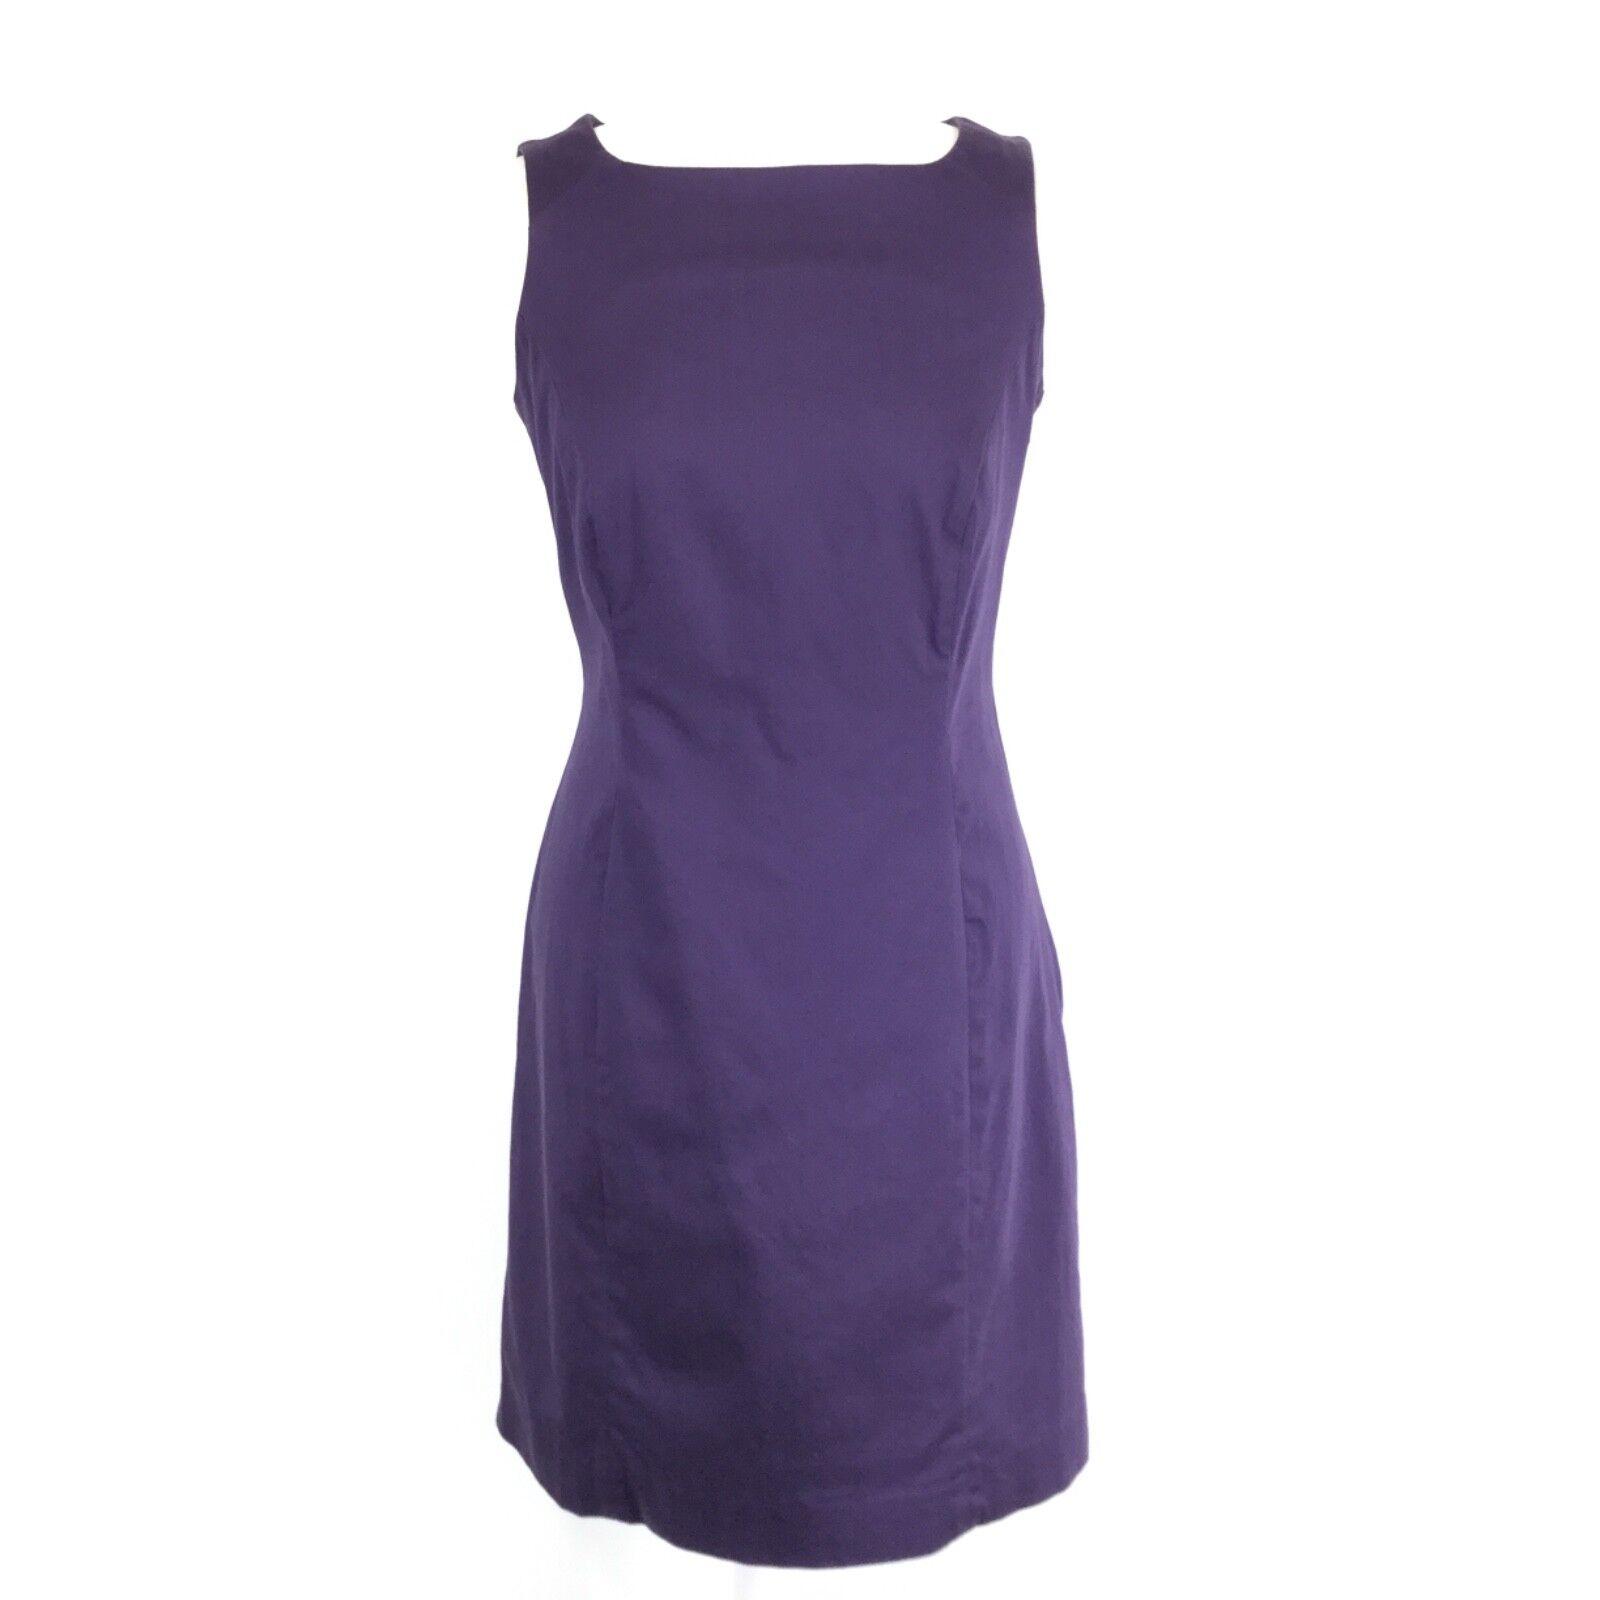 HOBBS Purple Classic Sleeveless Pencil Wiggle Dress 12